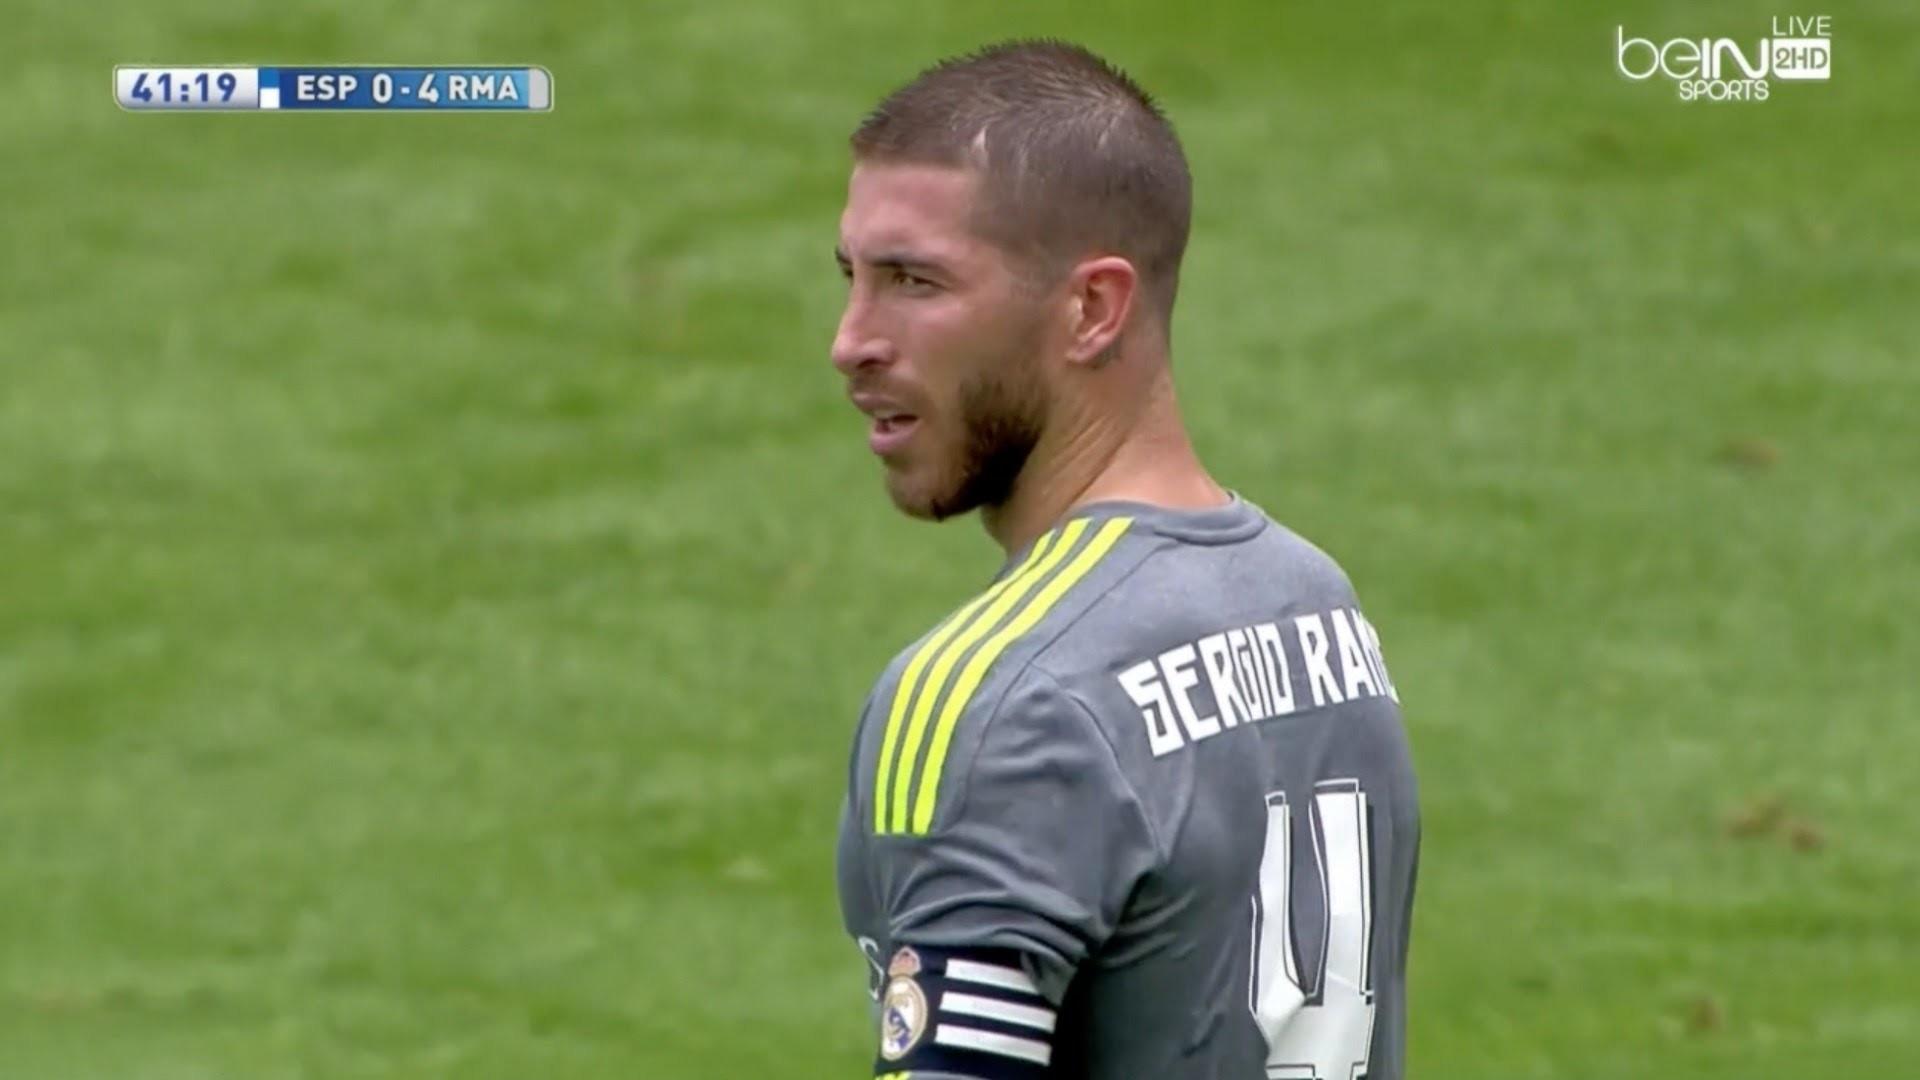 Real Madrid Wallpaper Full Hd Sergio Ramos 2018 Wallpaper Hd 73 Images